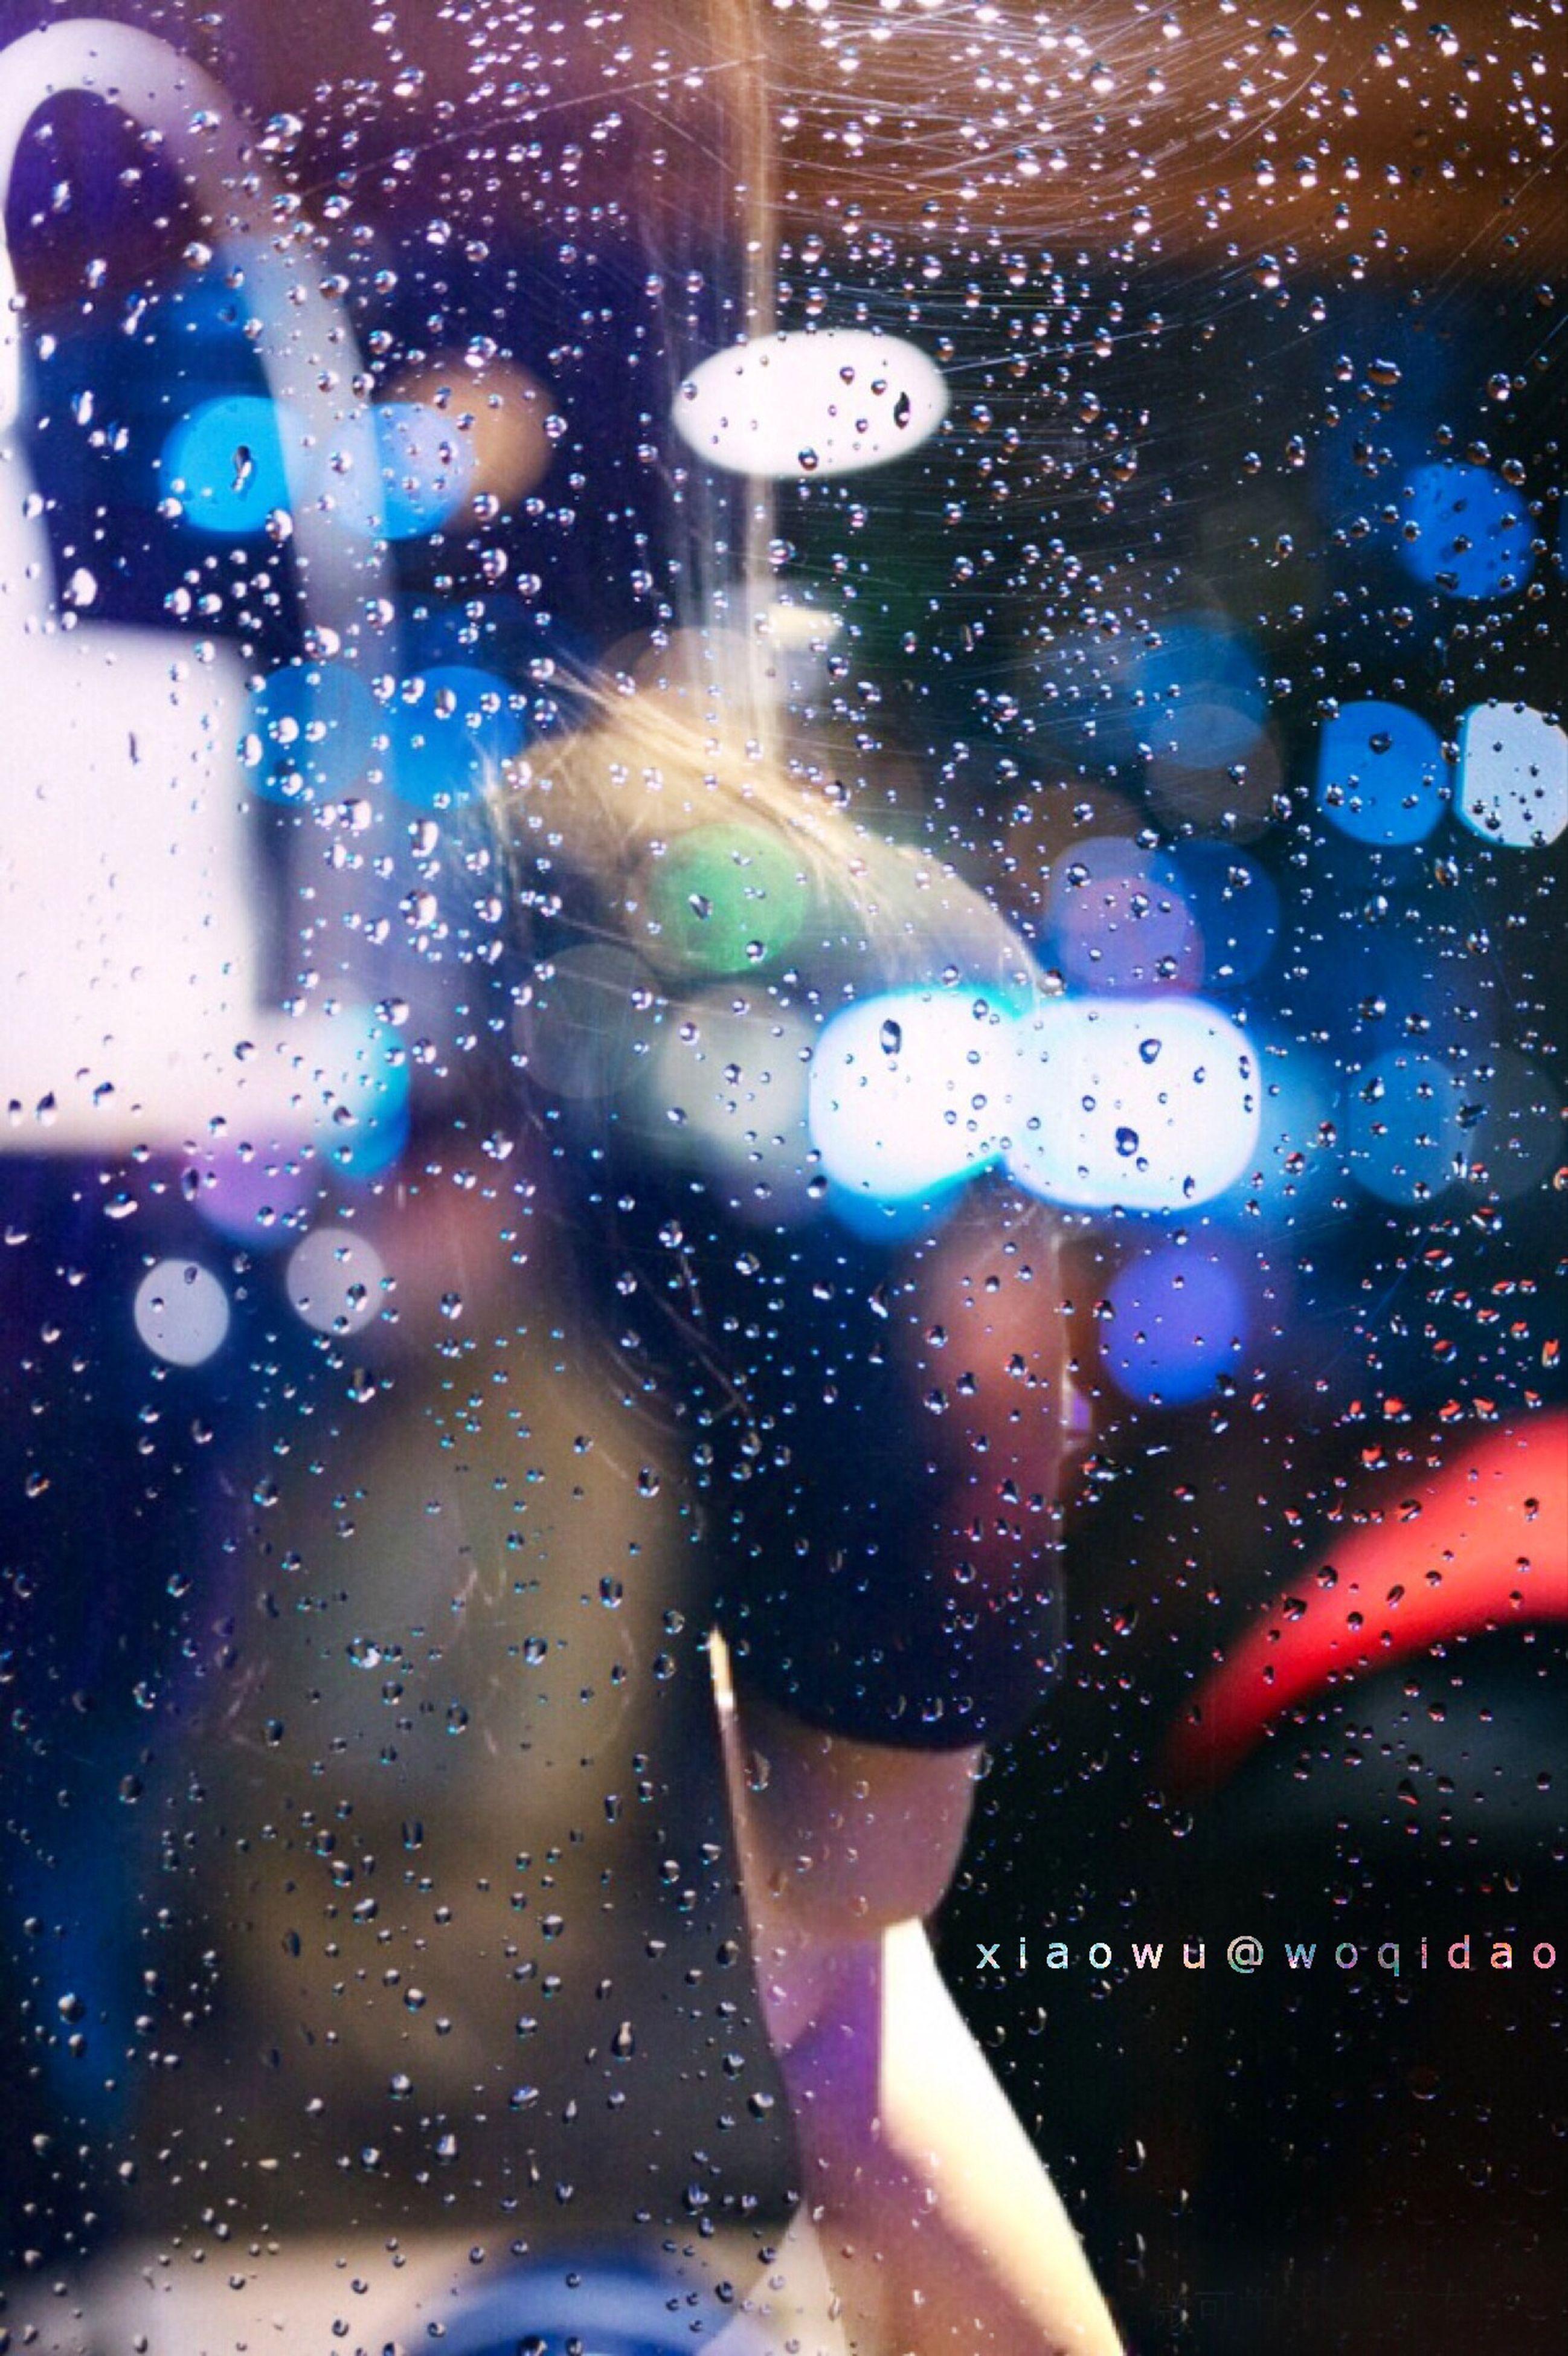 drop, transparent, glass - material, wet, window, indoors, rain, car, water, illuminated, night, glass, land vehicle, raindrop, transportation, vehicle interior, season, windshield, street, mode of transport